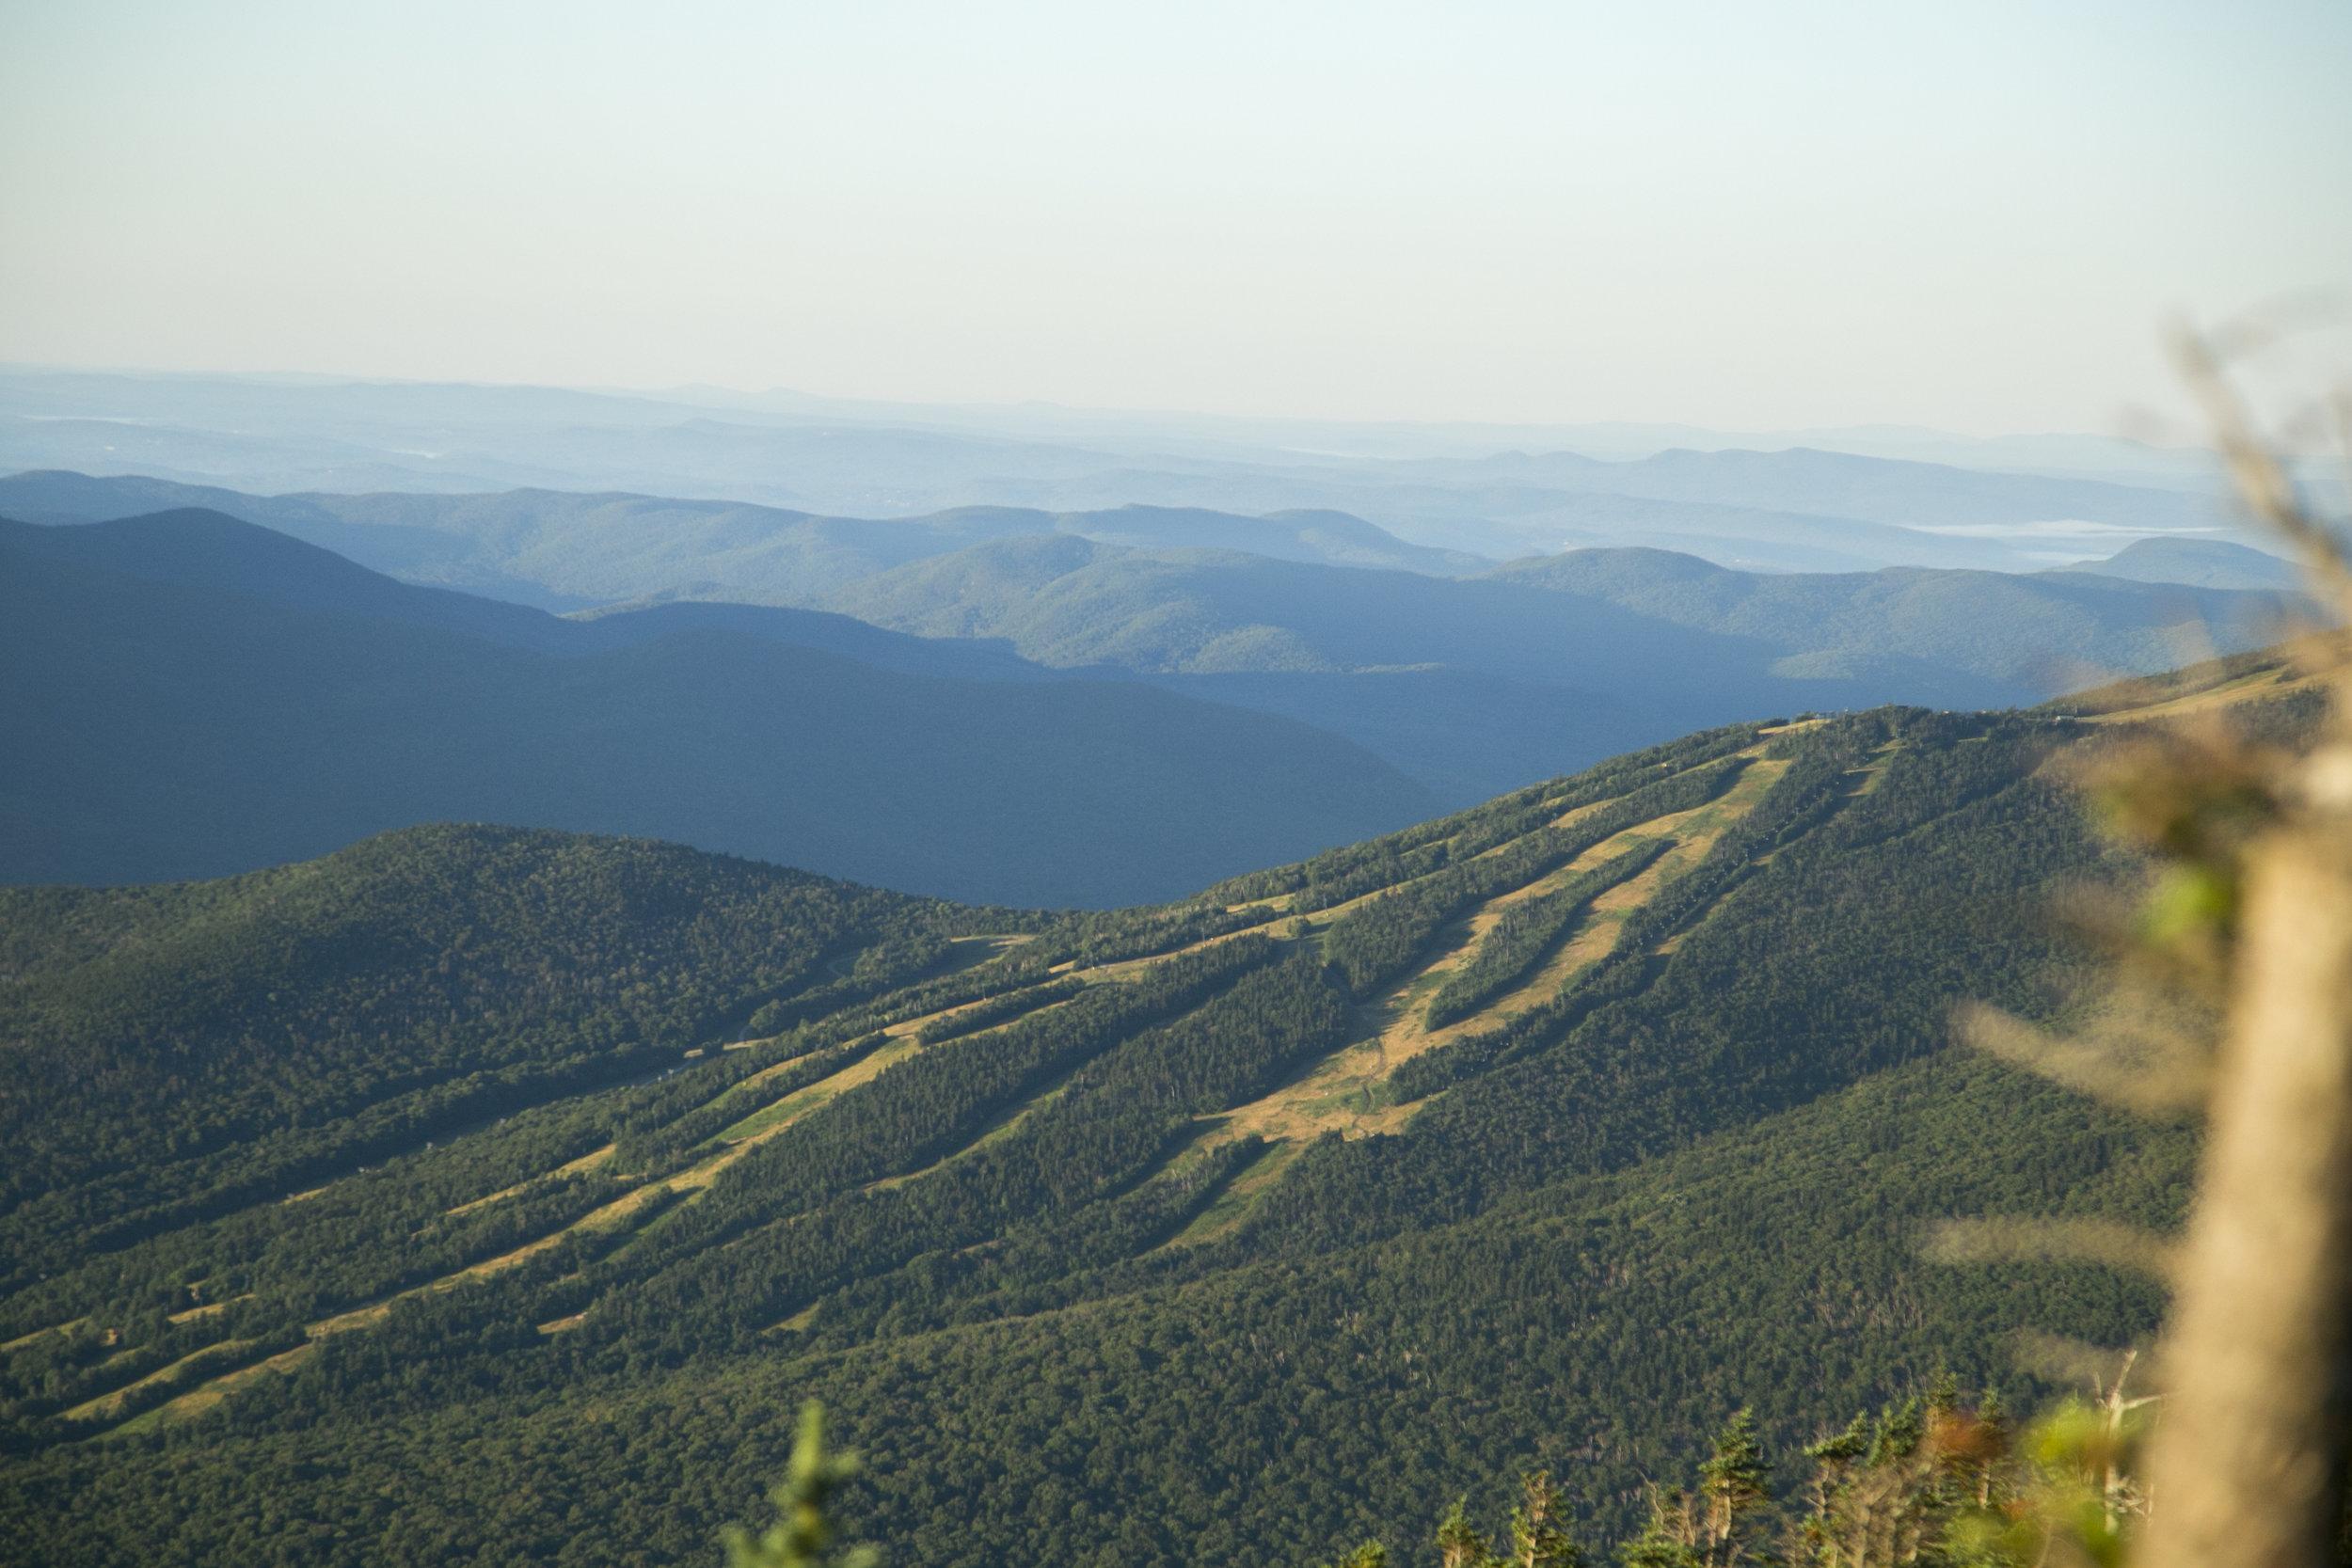 View of Waterville Valley Ski Resort